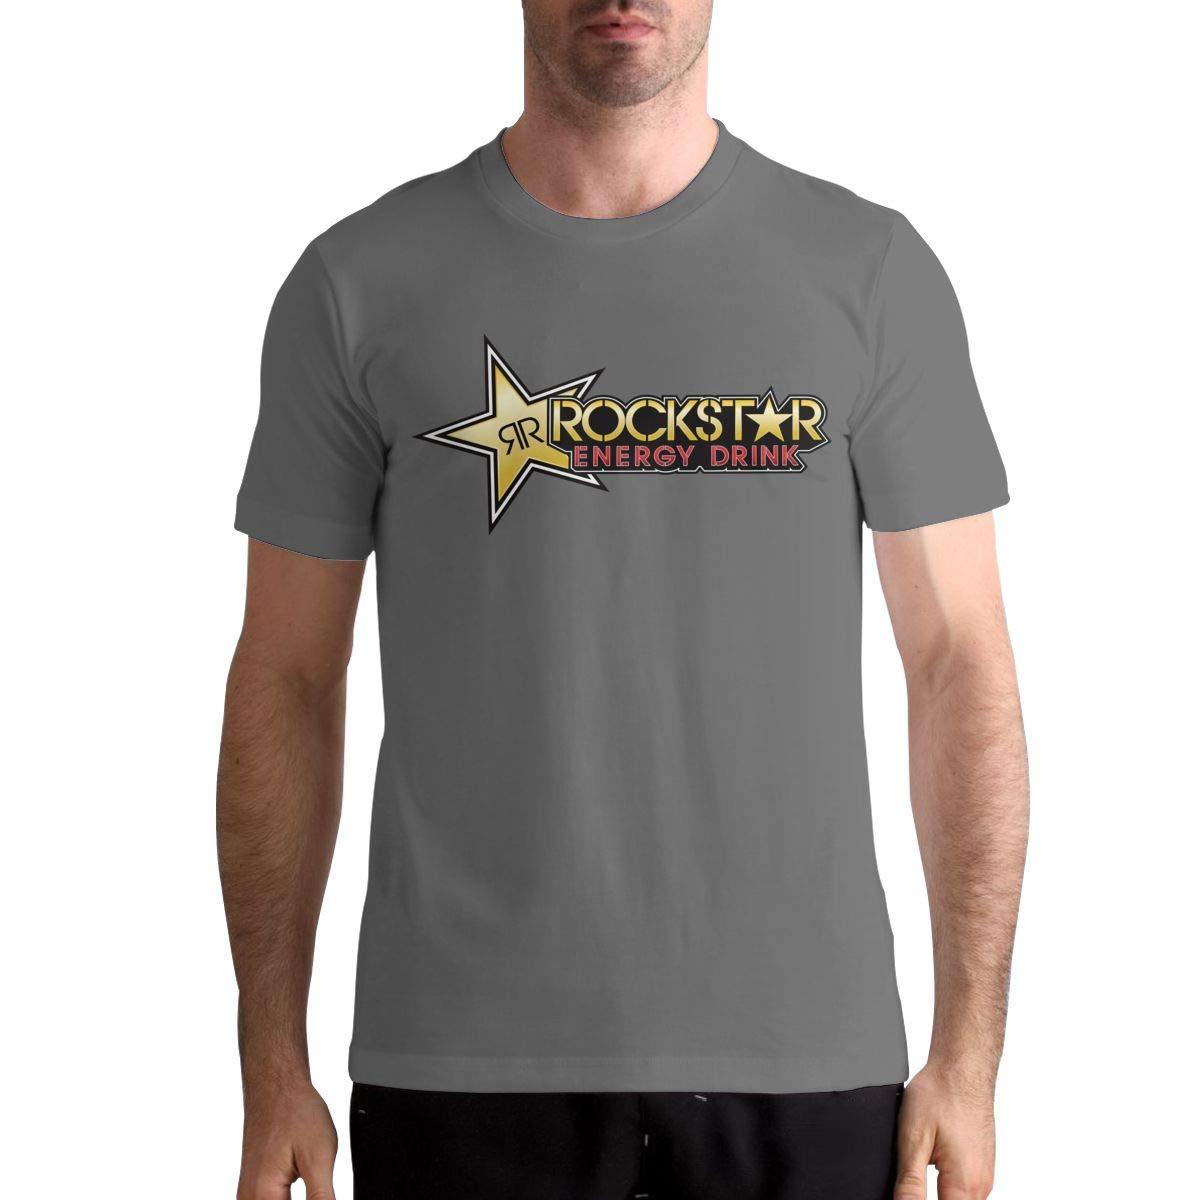 Thomlarryca Rockstar Energy Drink Classic Leisure T Shirts For Black